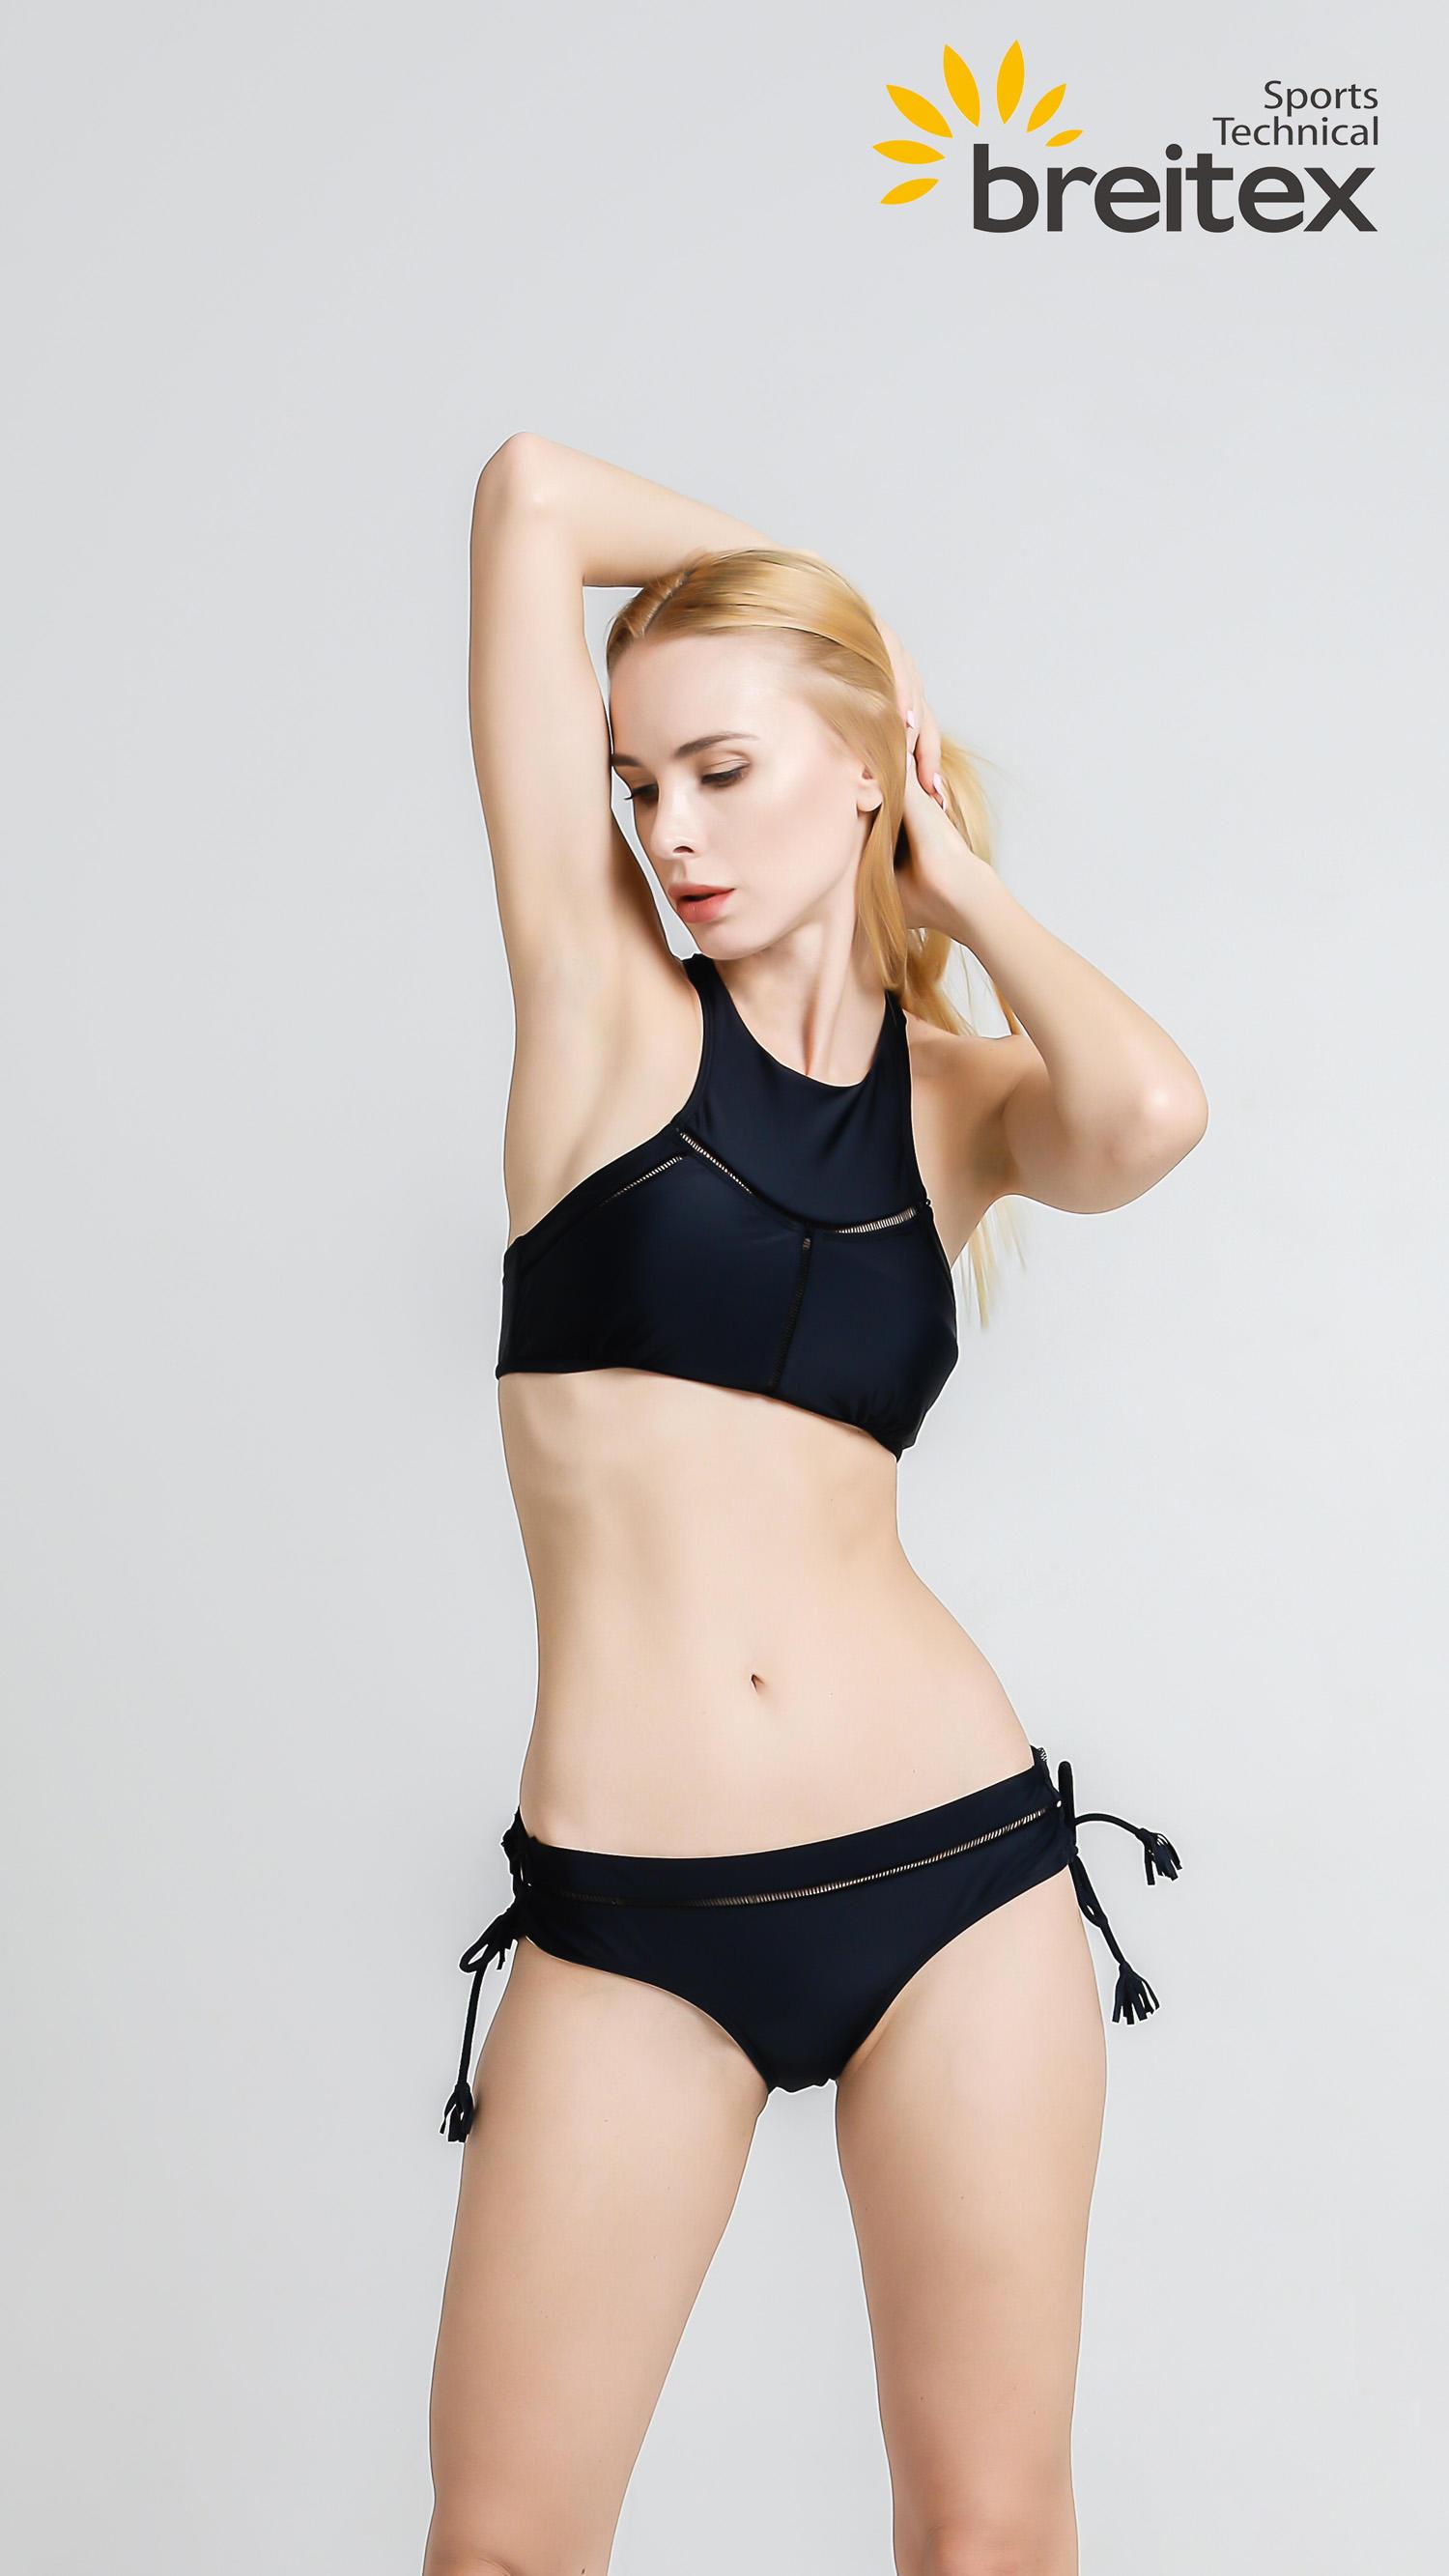 product-Womens Black Strap Back Crop Criss-cross Rope Bottom Bikini Set from Breitex-Breitex-img-1